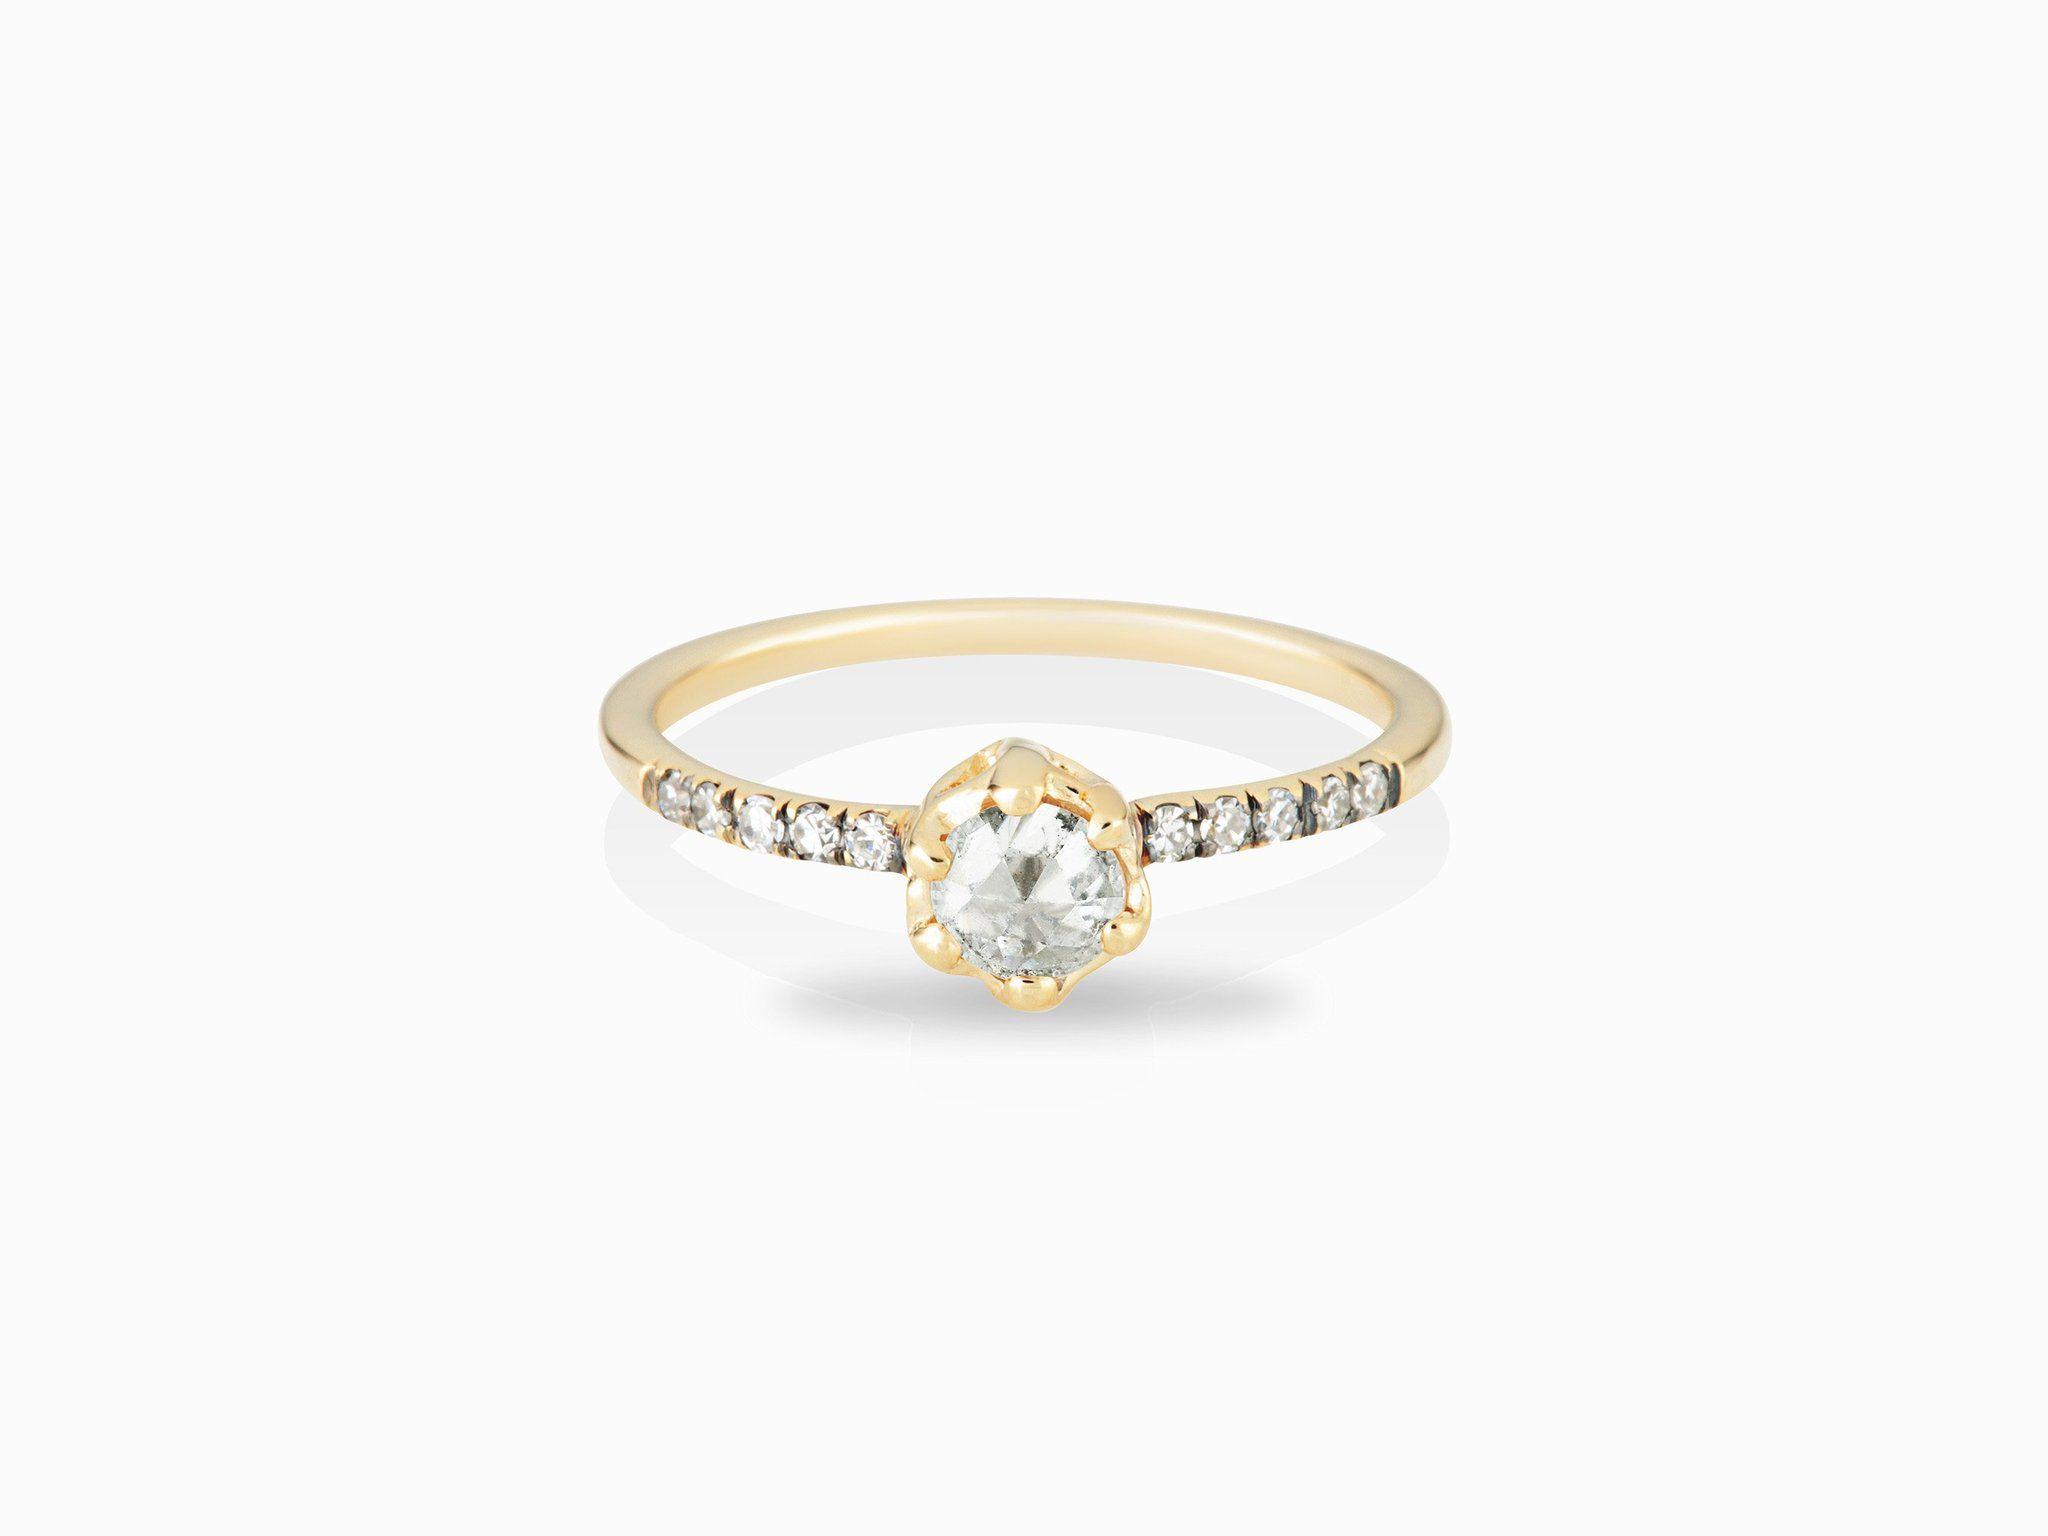 Small diamond engagement ring